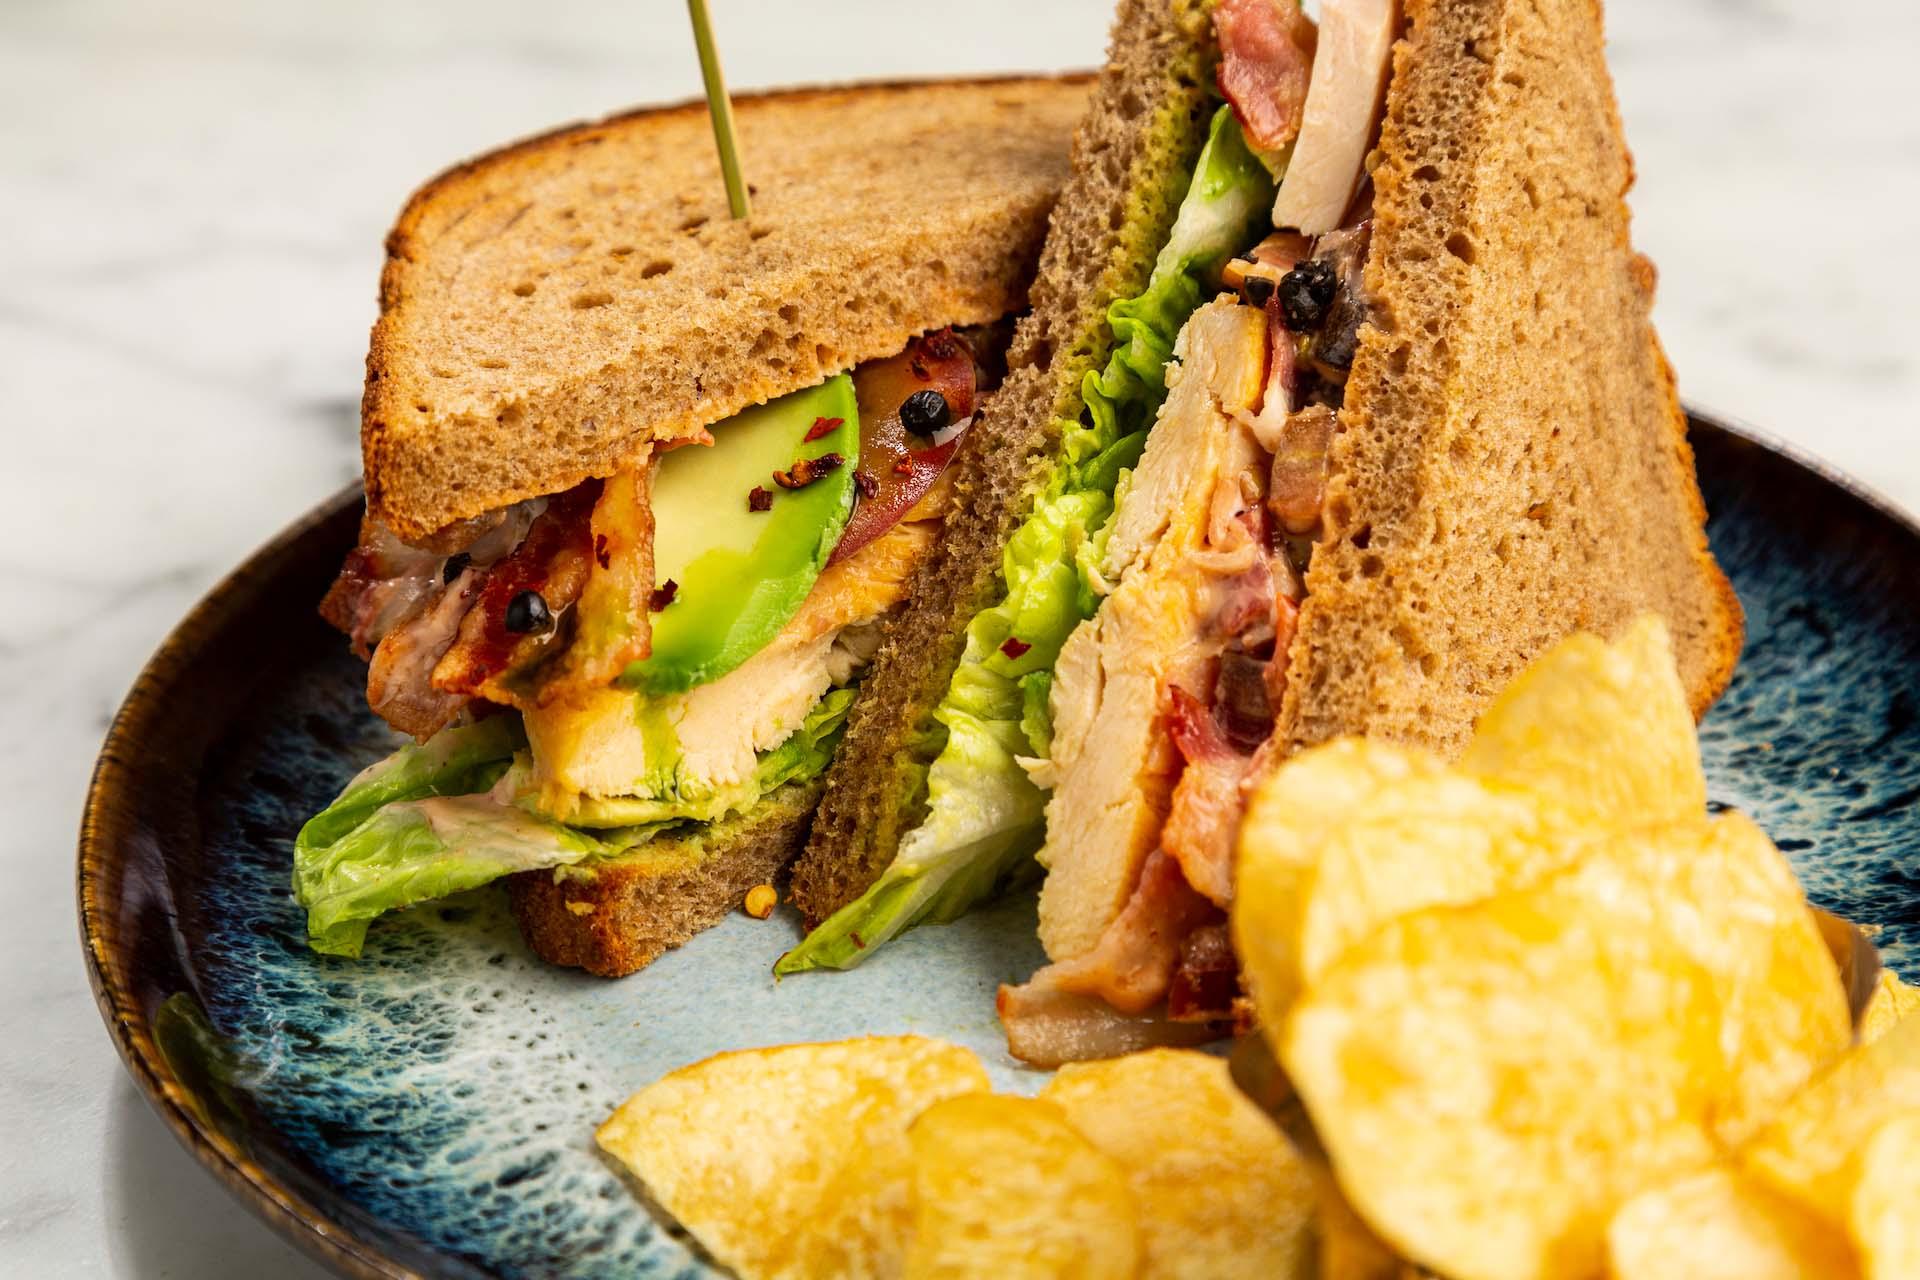 Chinaski Club Sandwich